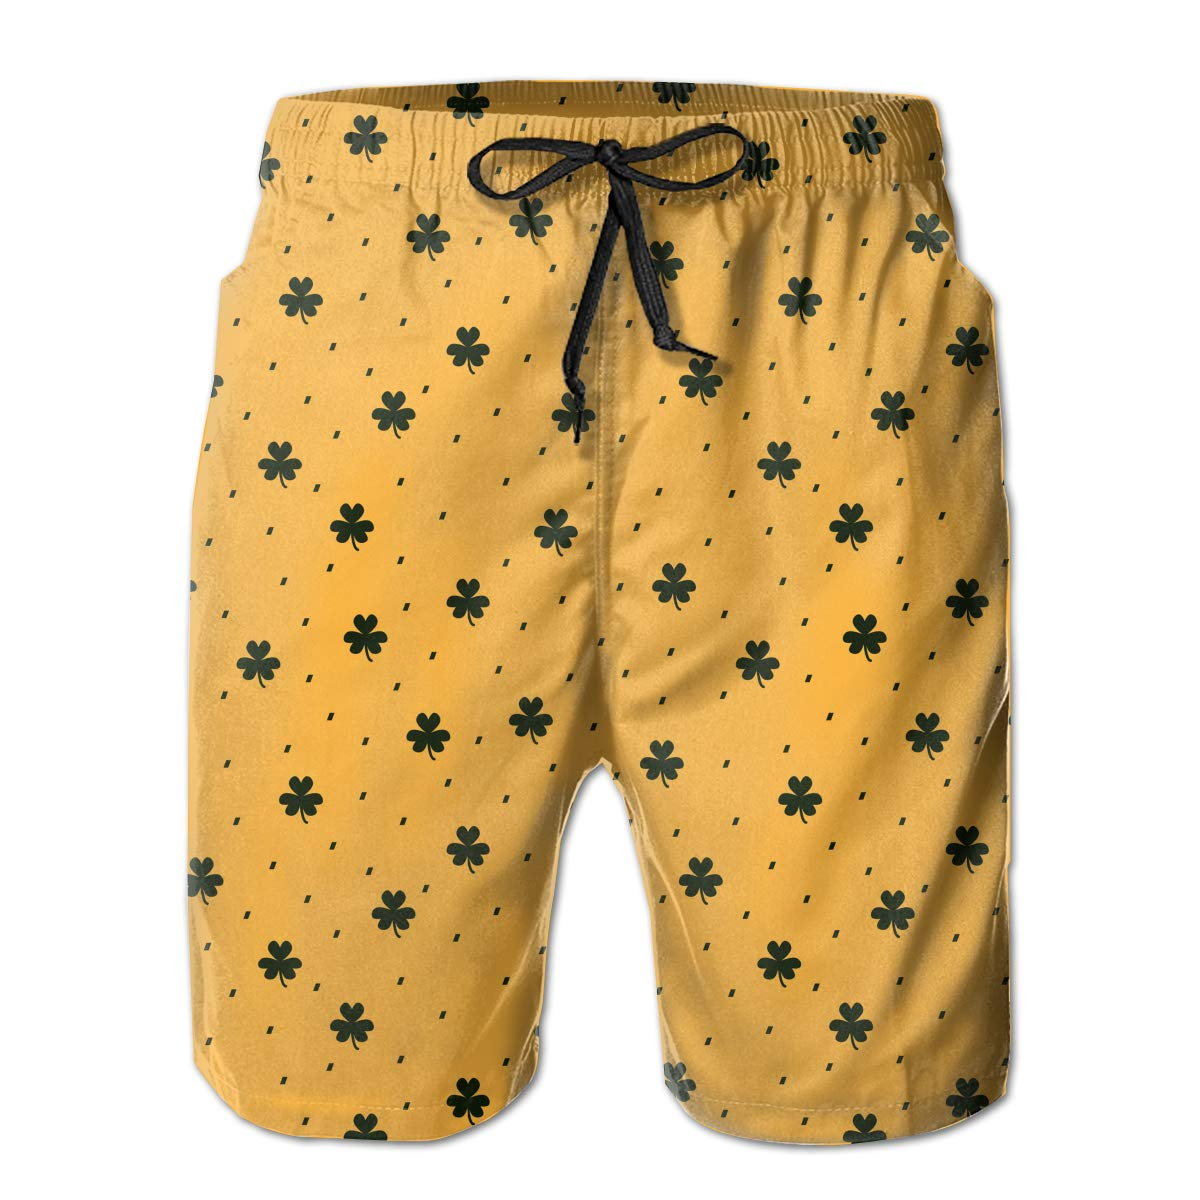 Isaa Miill Mens Casual Swim Trunks Beach Shorts with Elastic Waist